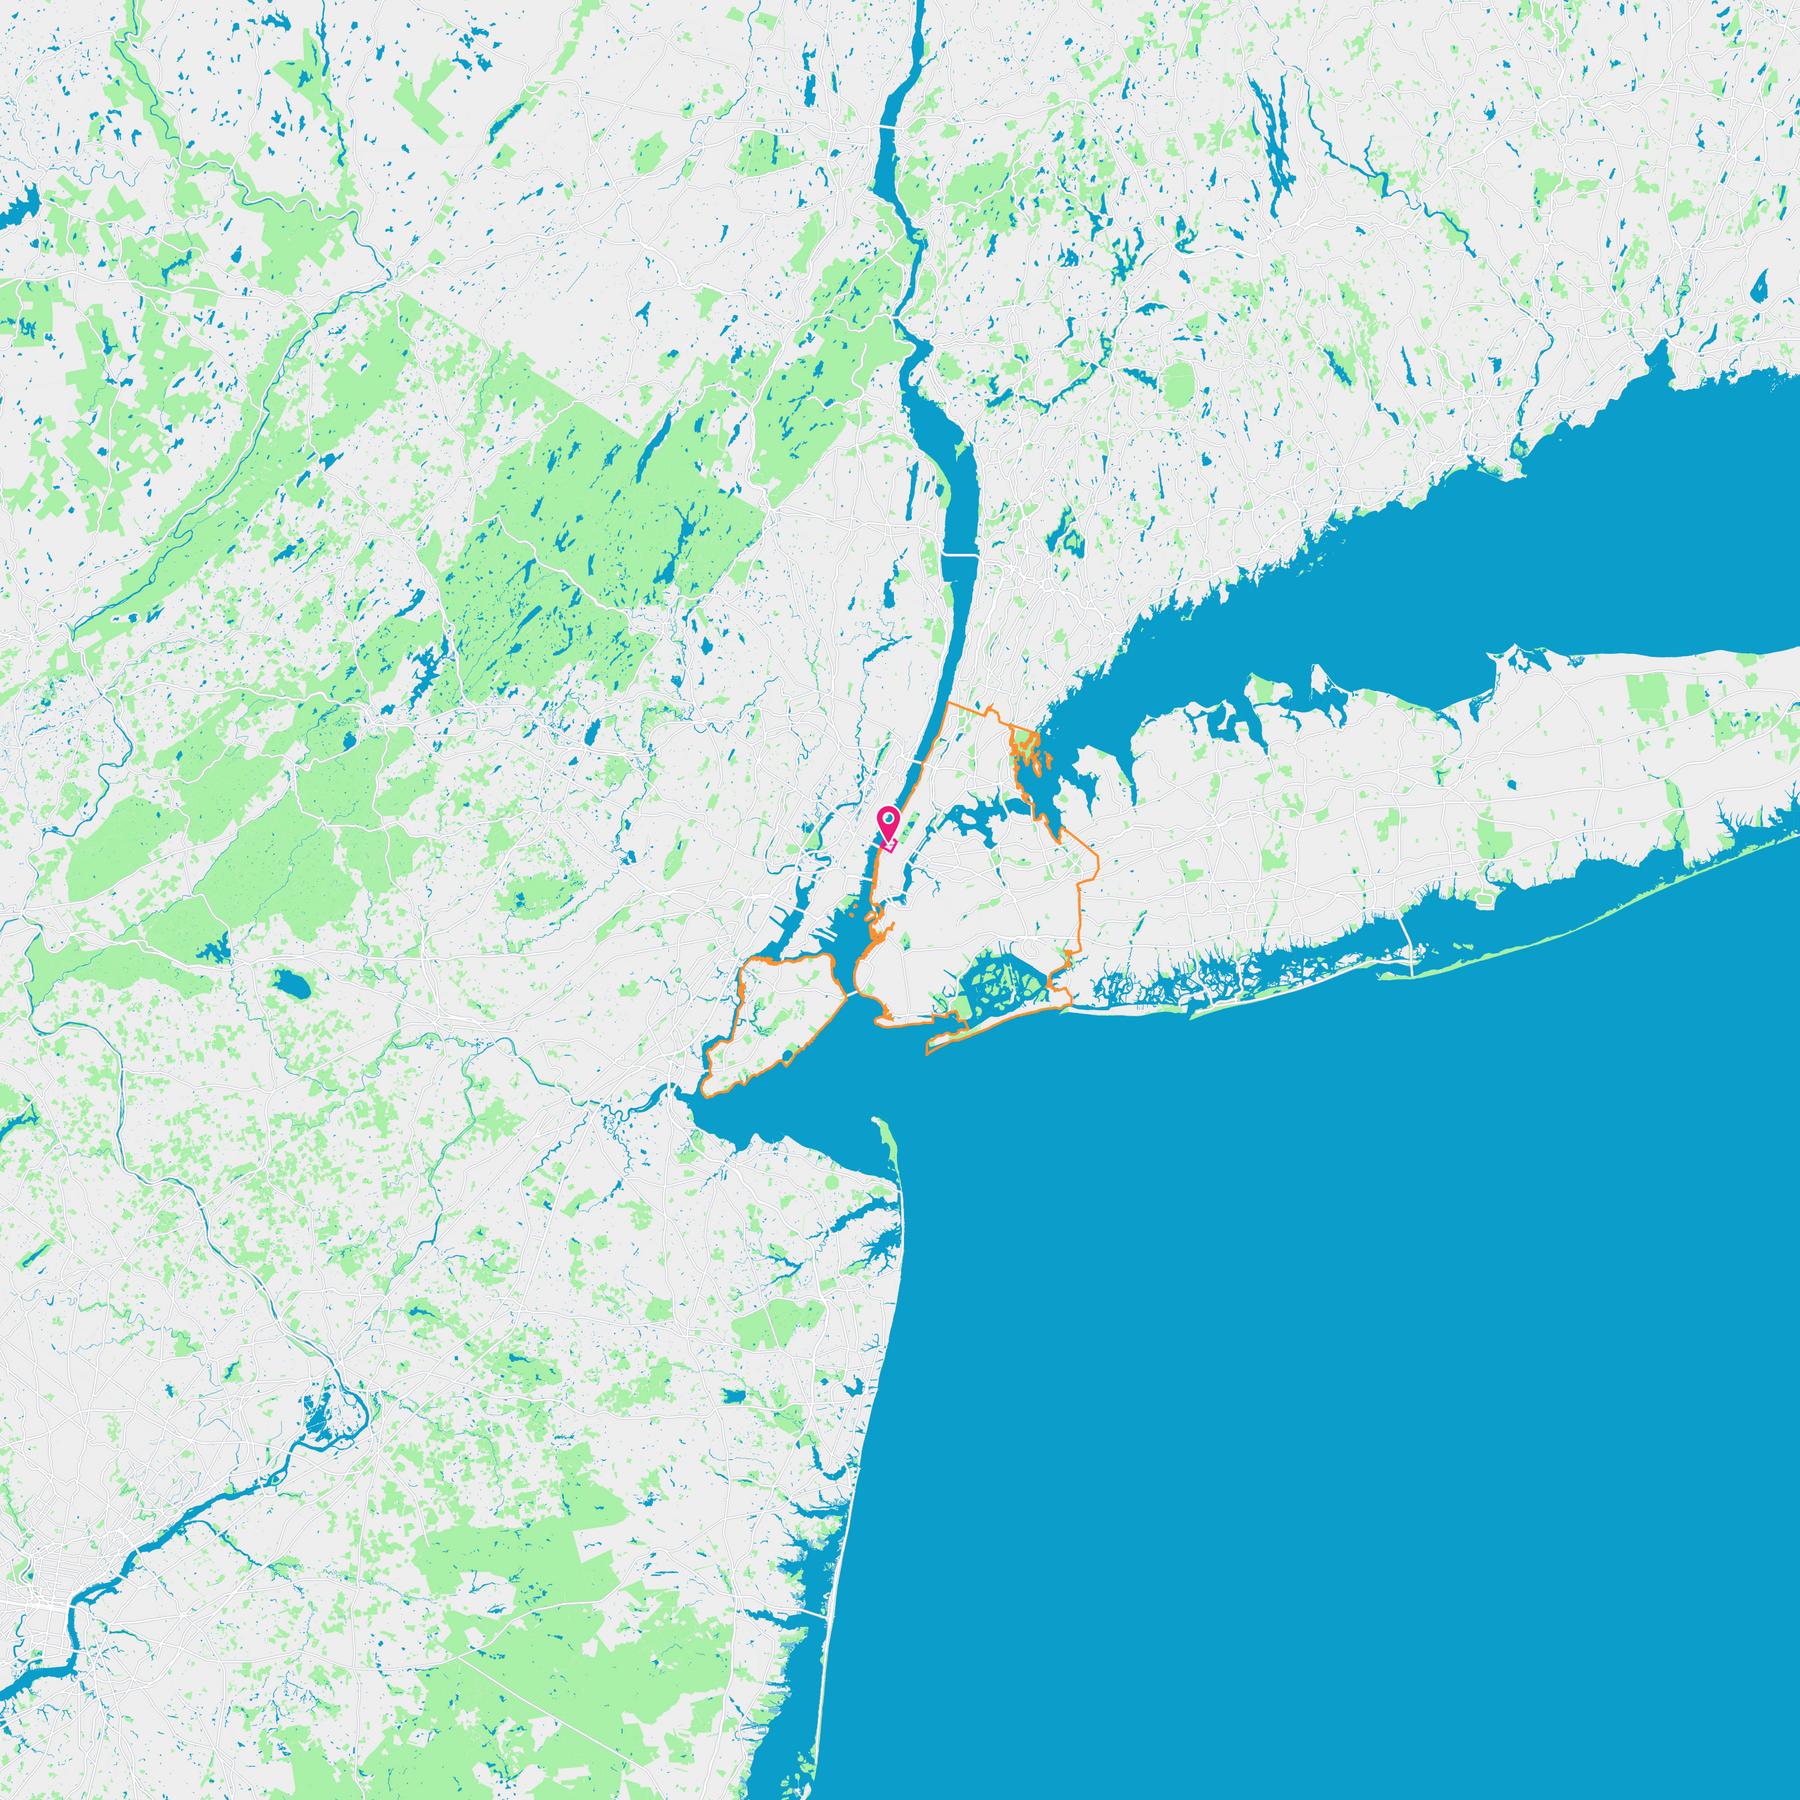 Hells Kitchen New York Map.Hell S Kitchen Neighborhood Guide New York Ny Trulia